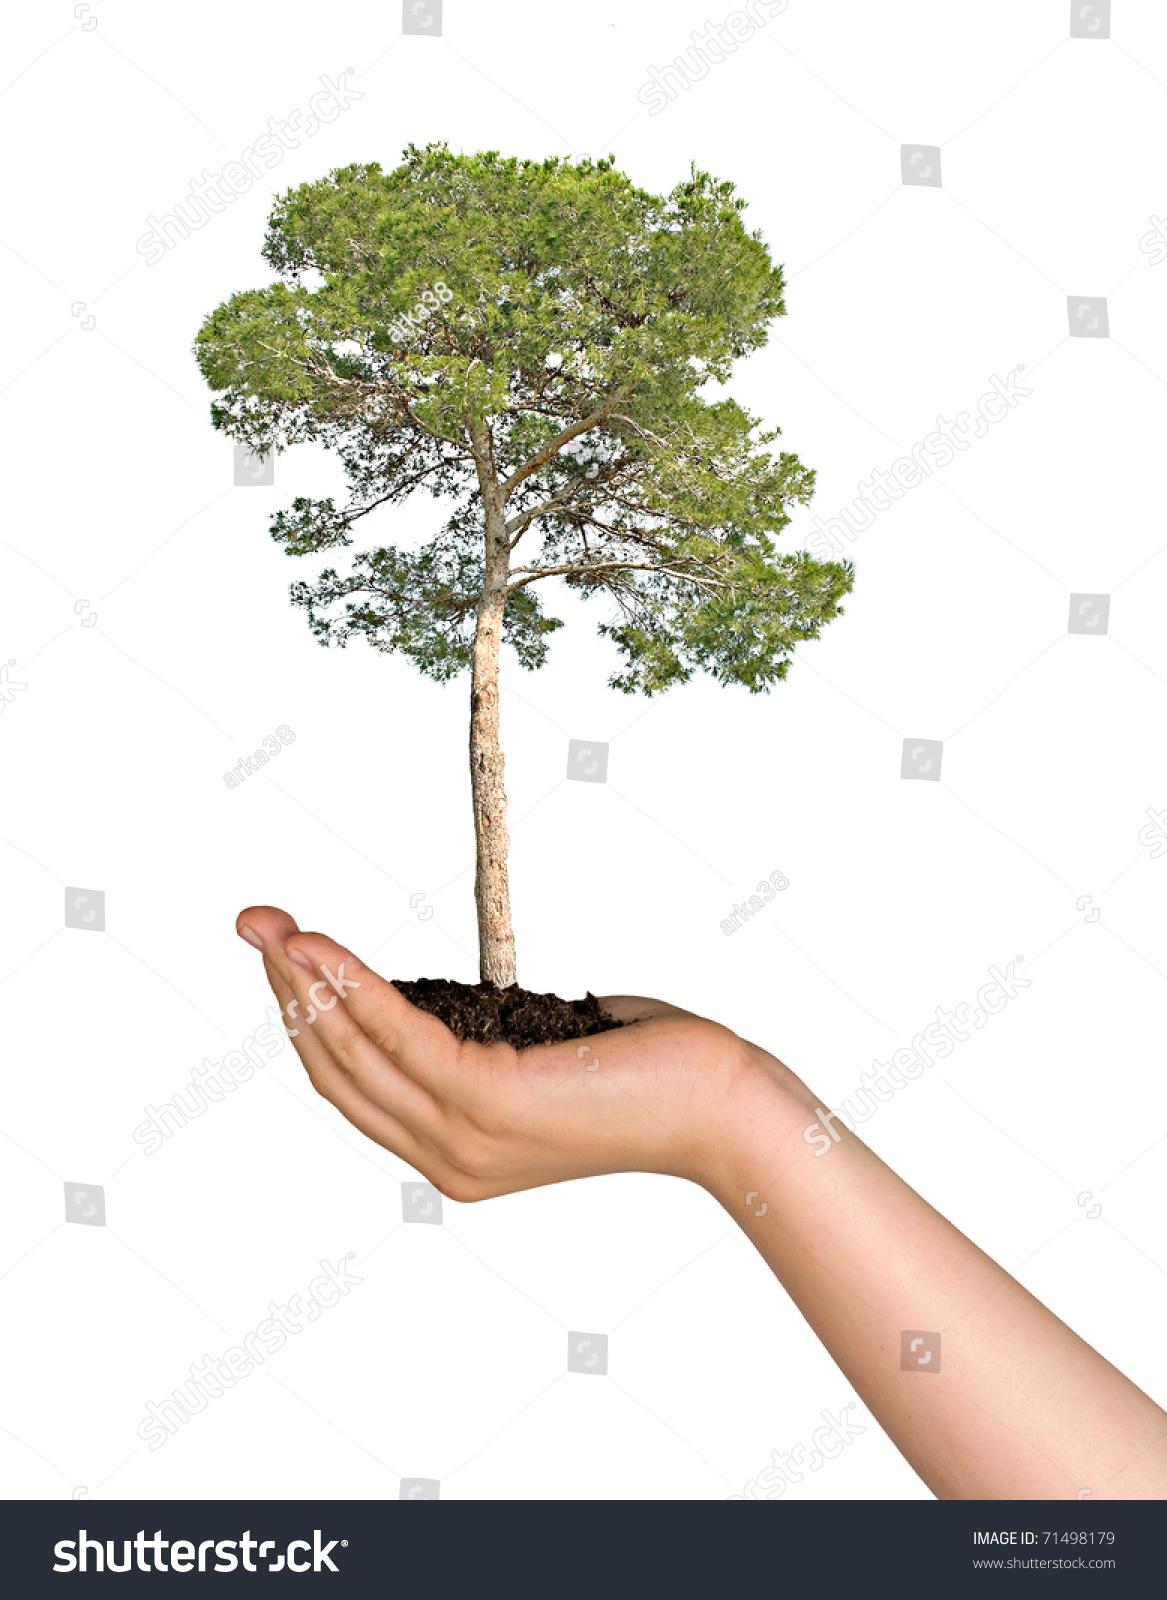 Pine tree hand symbol nature protection stock photo 71498179 pine tree in hand as a symbol of nature protection biocorpaavc